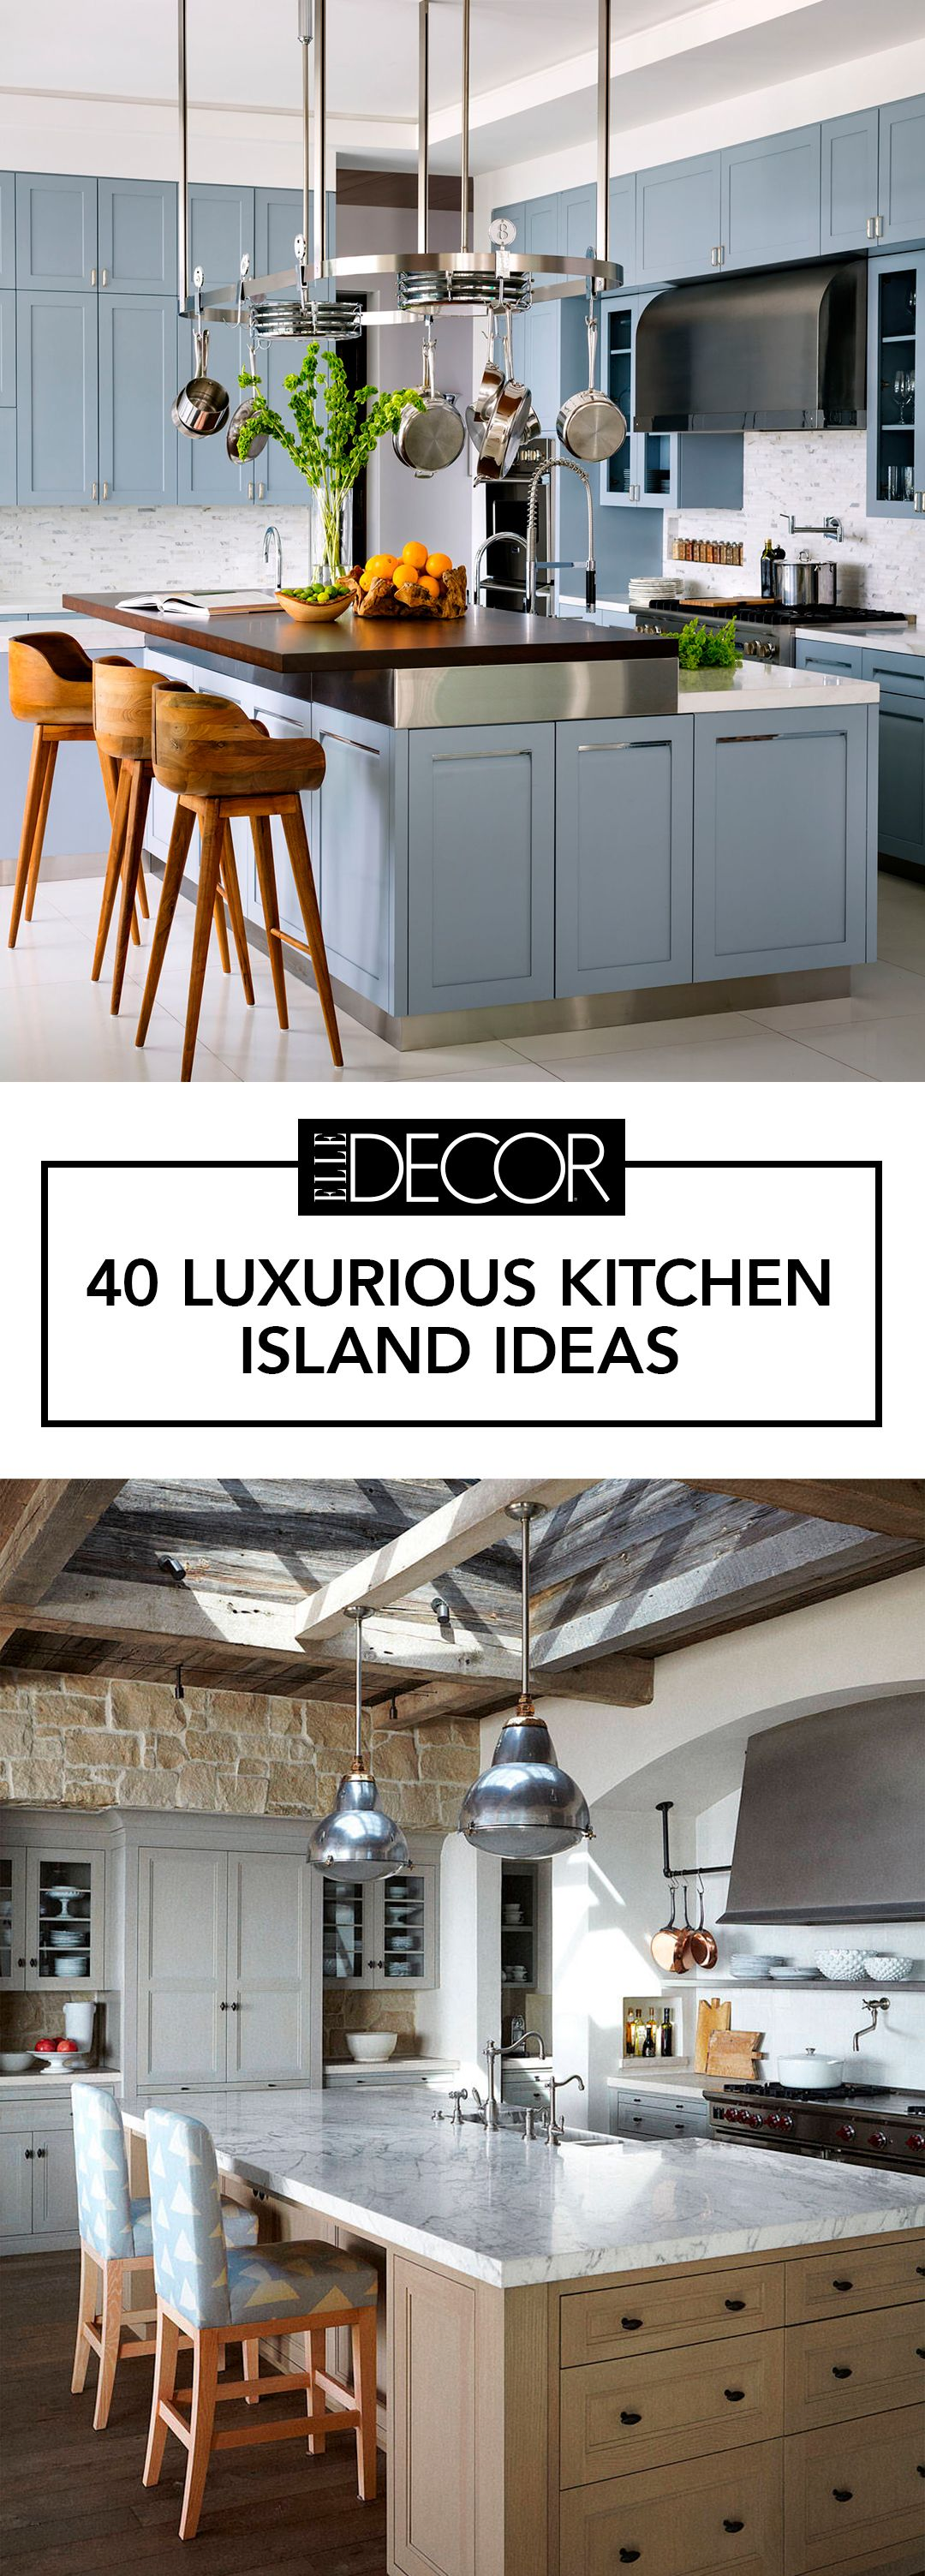 Favorite Seating Kitchen Island Images Kitchen Island Ideas Kitchen Islands Small Spaces Vintage Kitchen Island Images kitchen Kitchen Island Images